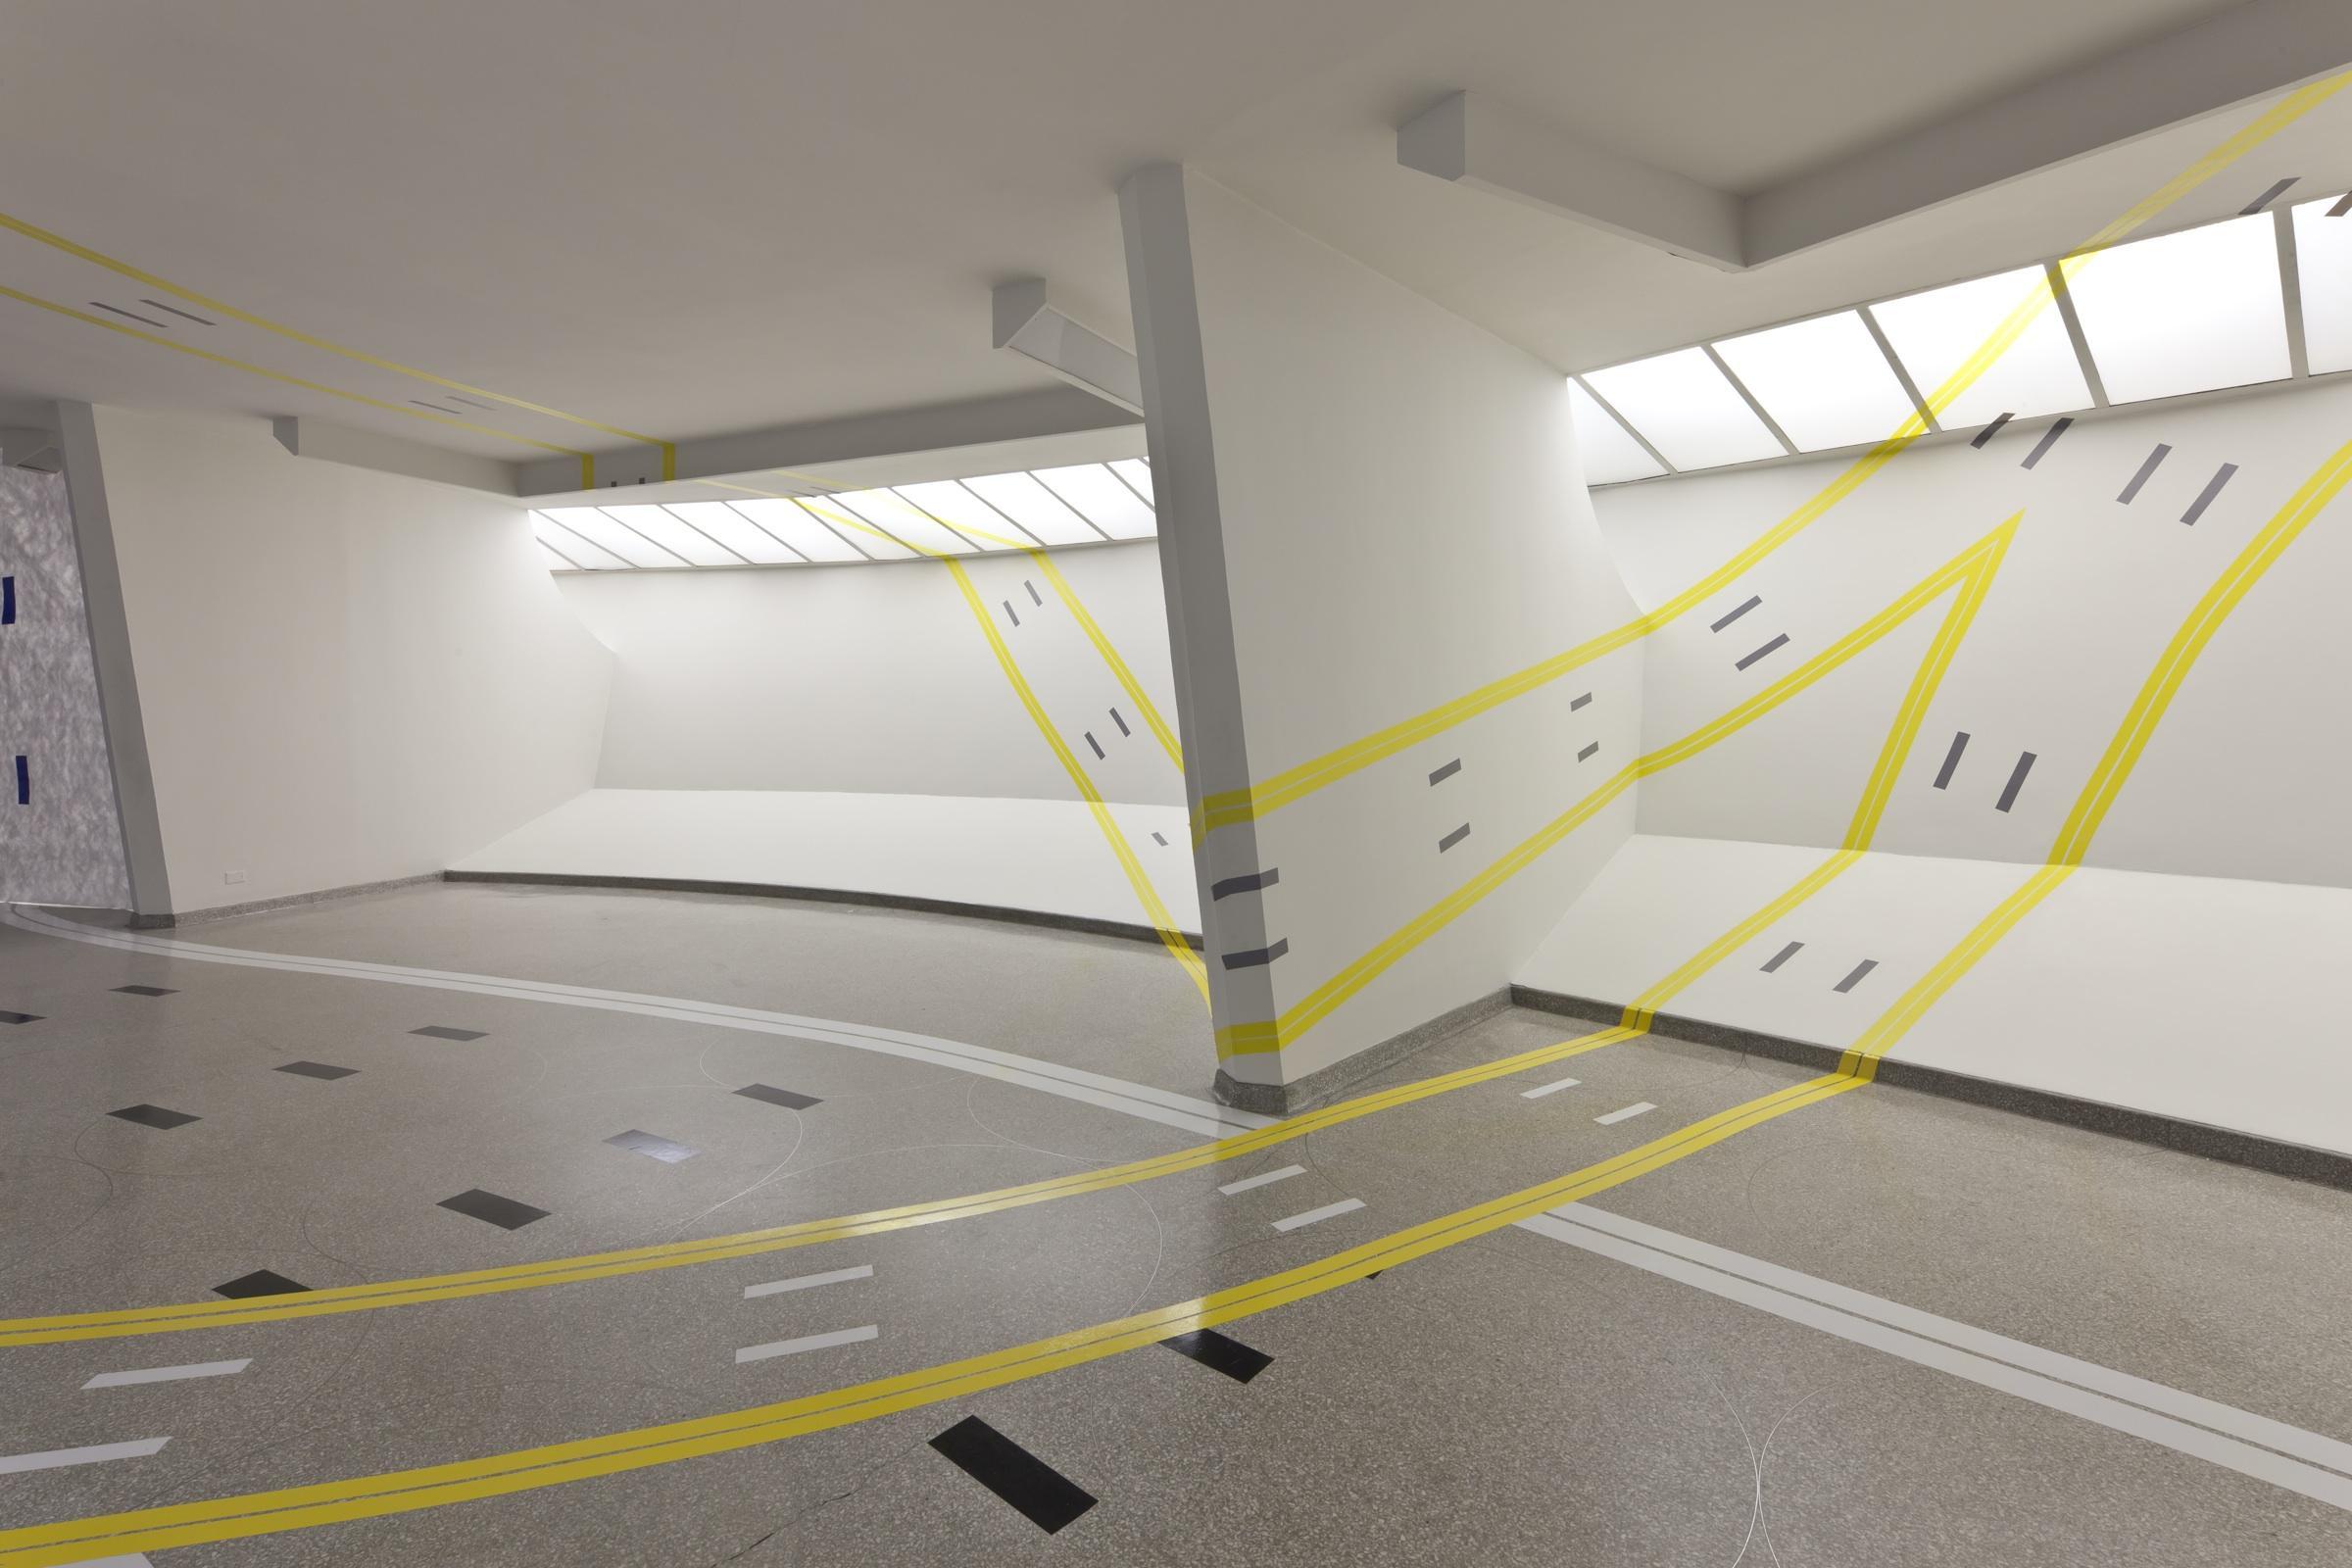 Modern Architecture The Guggenheim Museum In New York